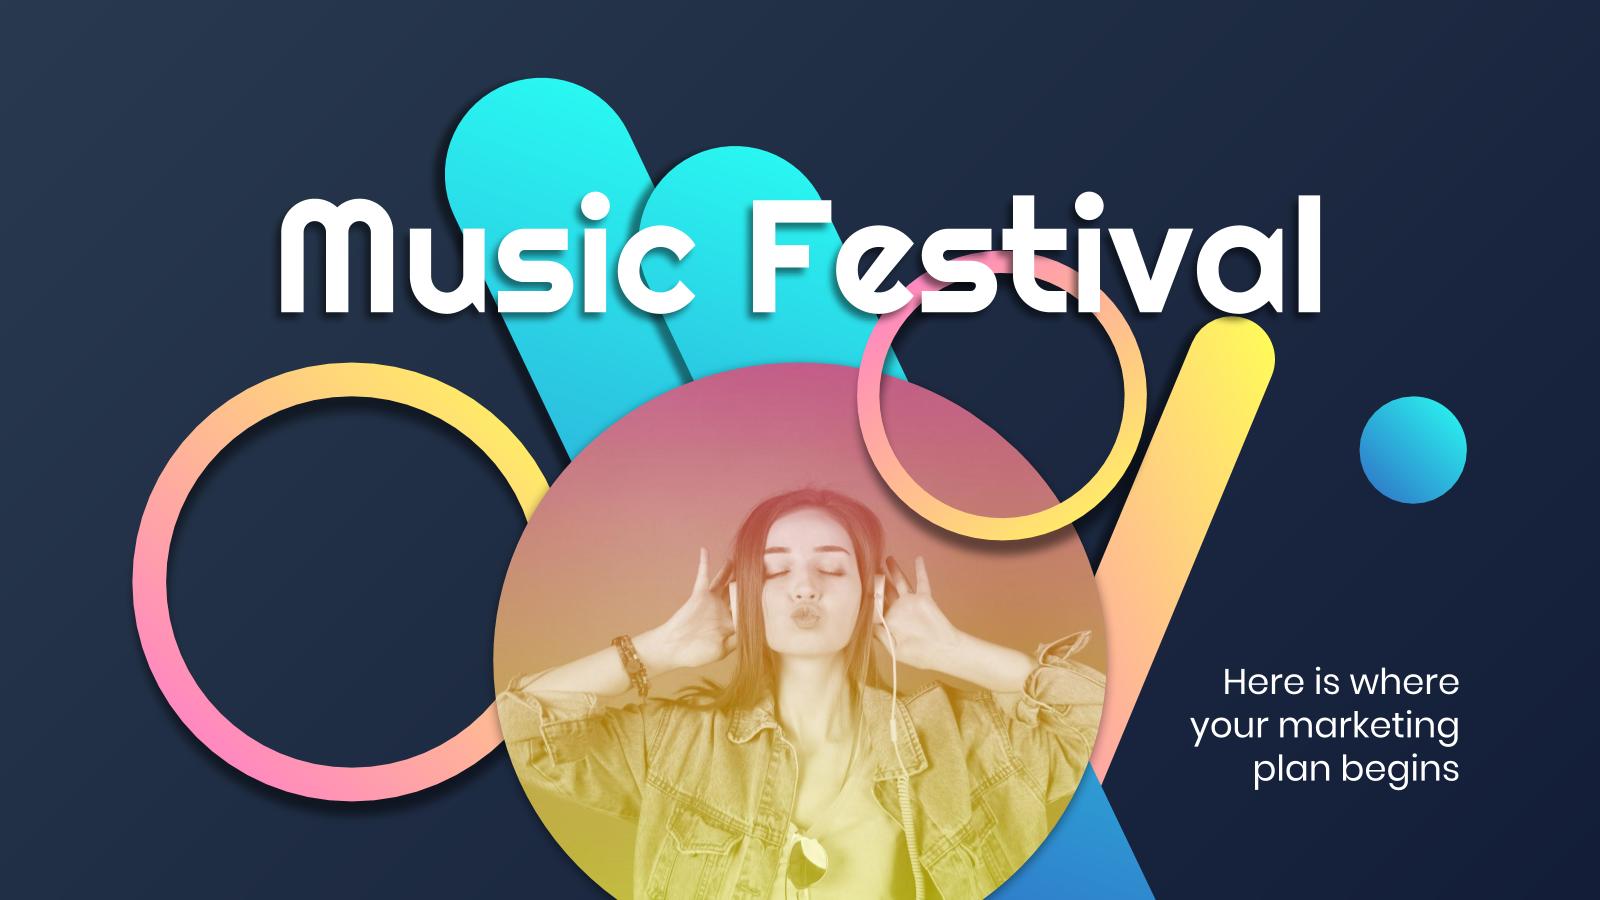 Music Festival Marketing Plan presentation template